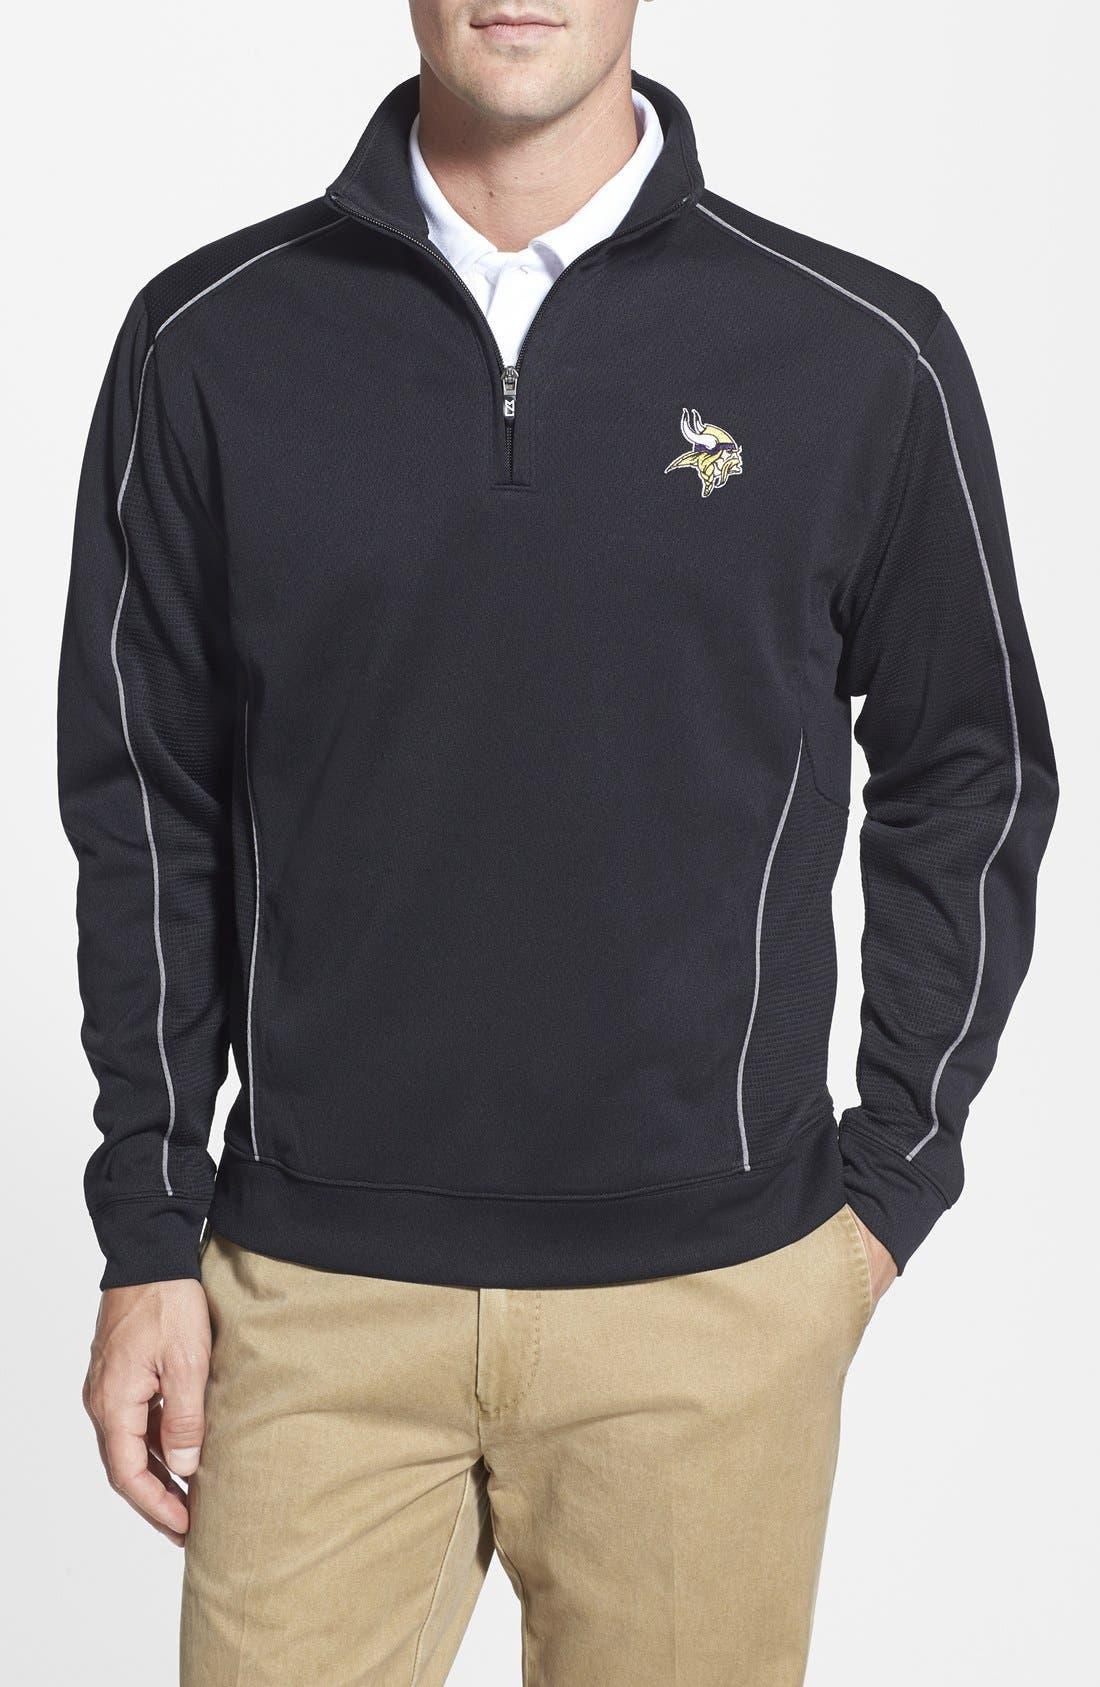 Cutter & Buck Minnesota Vikings - Edge DryTec Moisture Wicking Half Zip Pullover